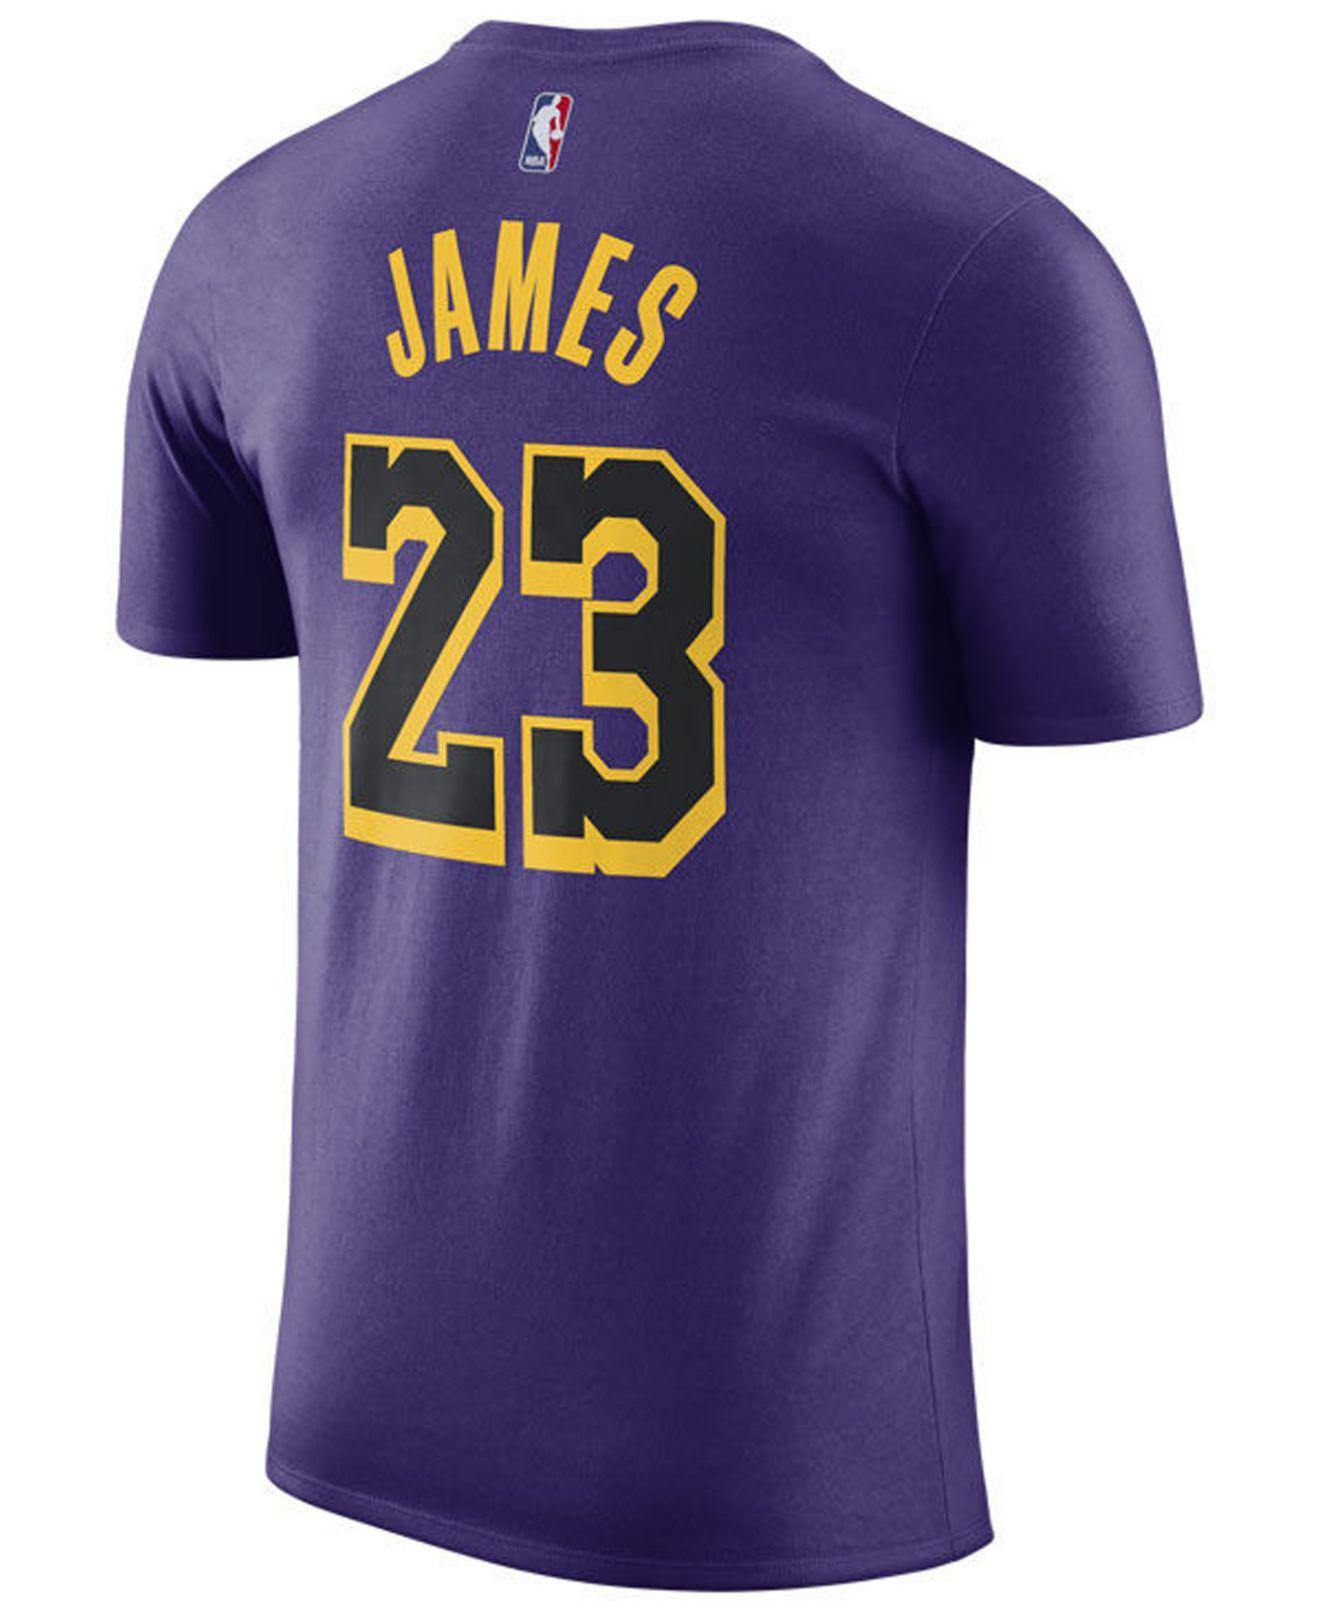 info for 69744 3e575 Men's Purple Lebron James Los Angeles Lakers City Player T-shirt 2018